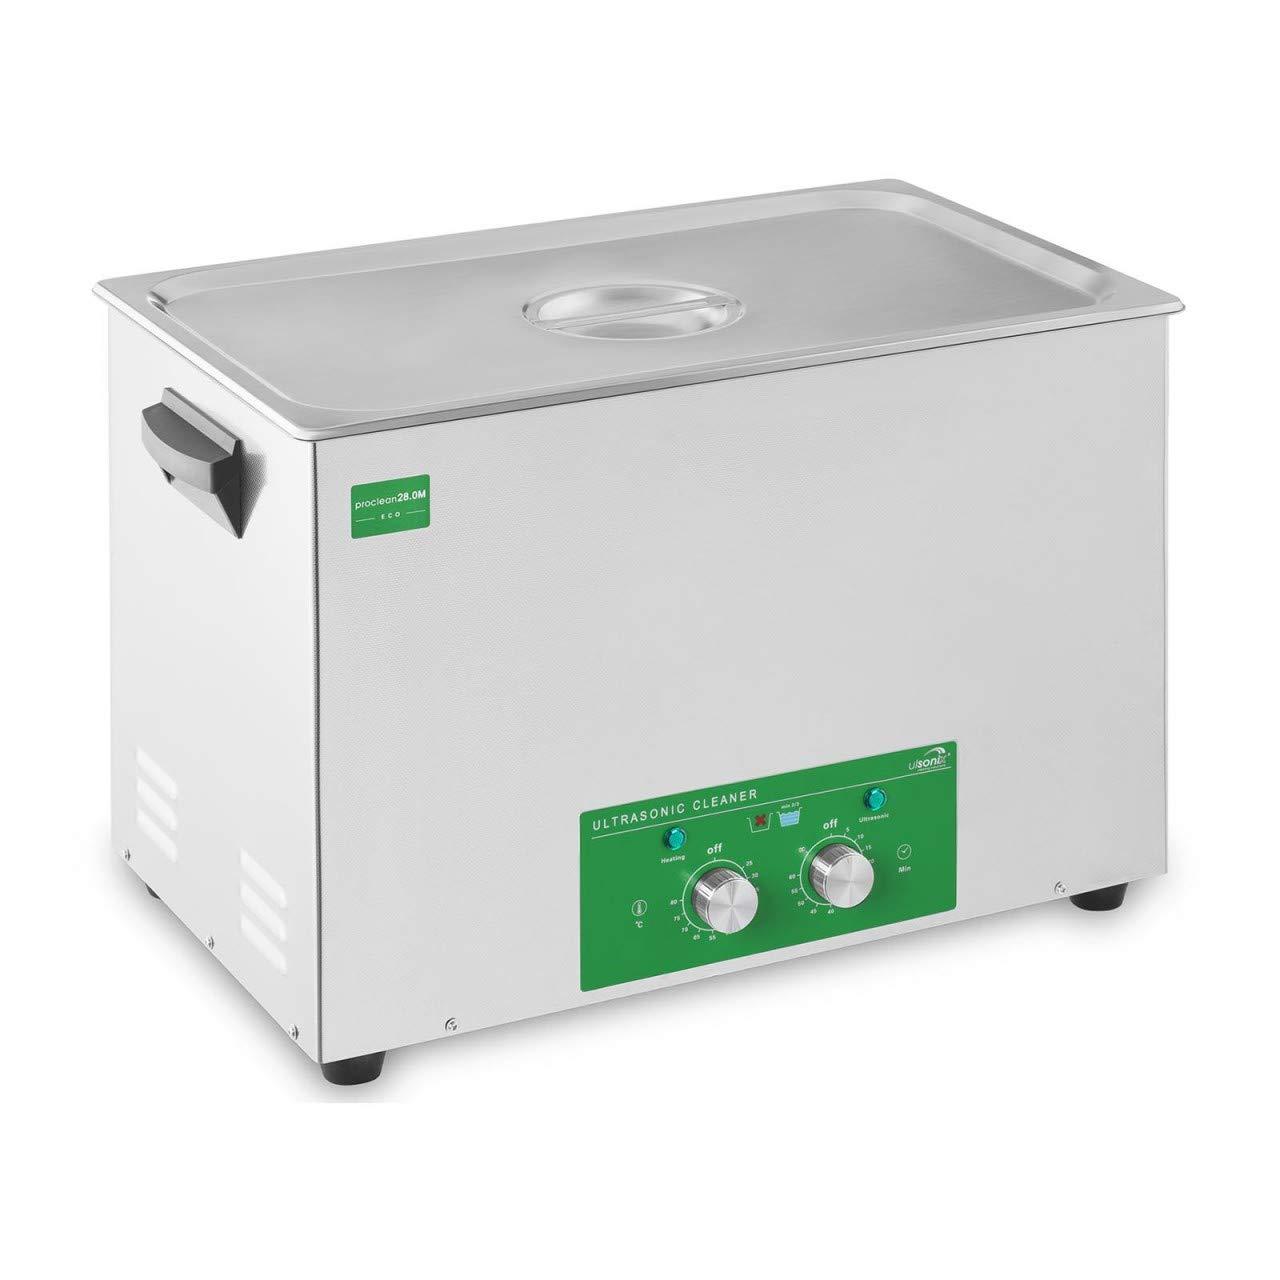 Ulsonix - PROCLEAN 10.0M ECO - Ultrasonic Cleaner (10 litres, 180 W, Eco)